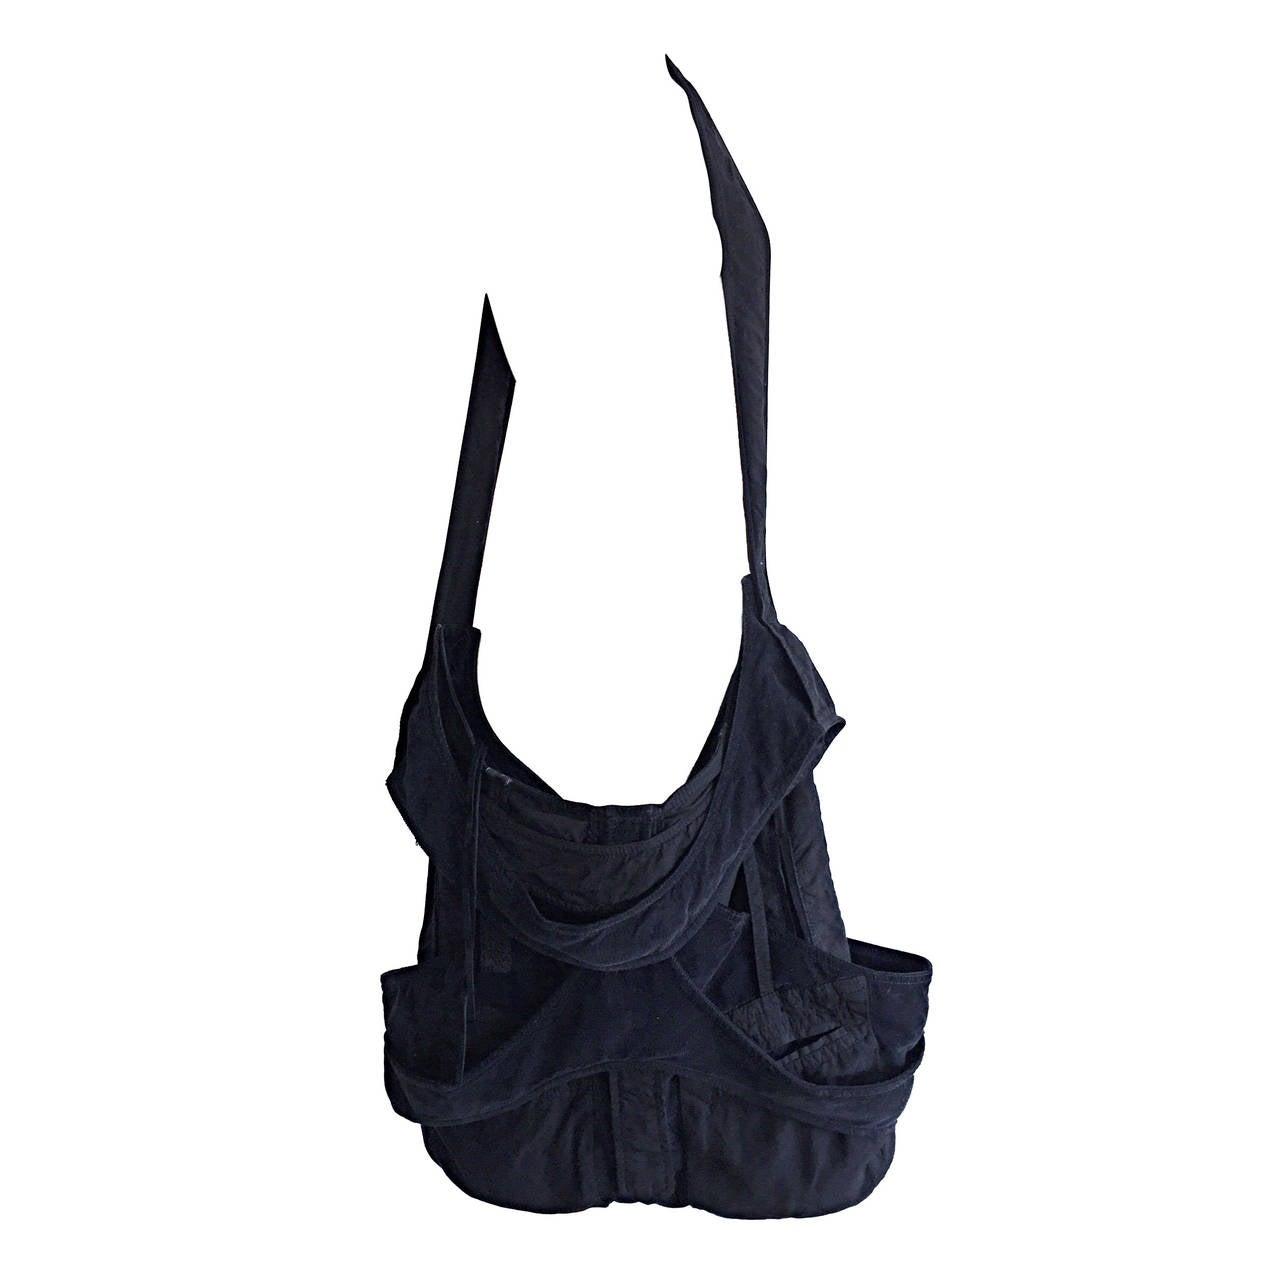 Limited Edition Balenciaga ' Matrix ' XL Black Weekender Crossbody Unisex Bag